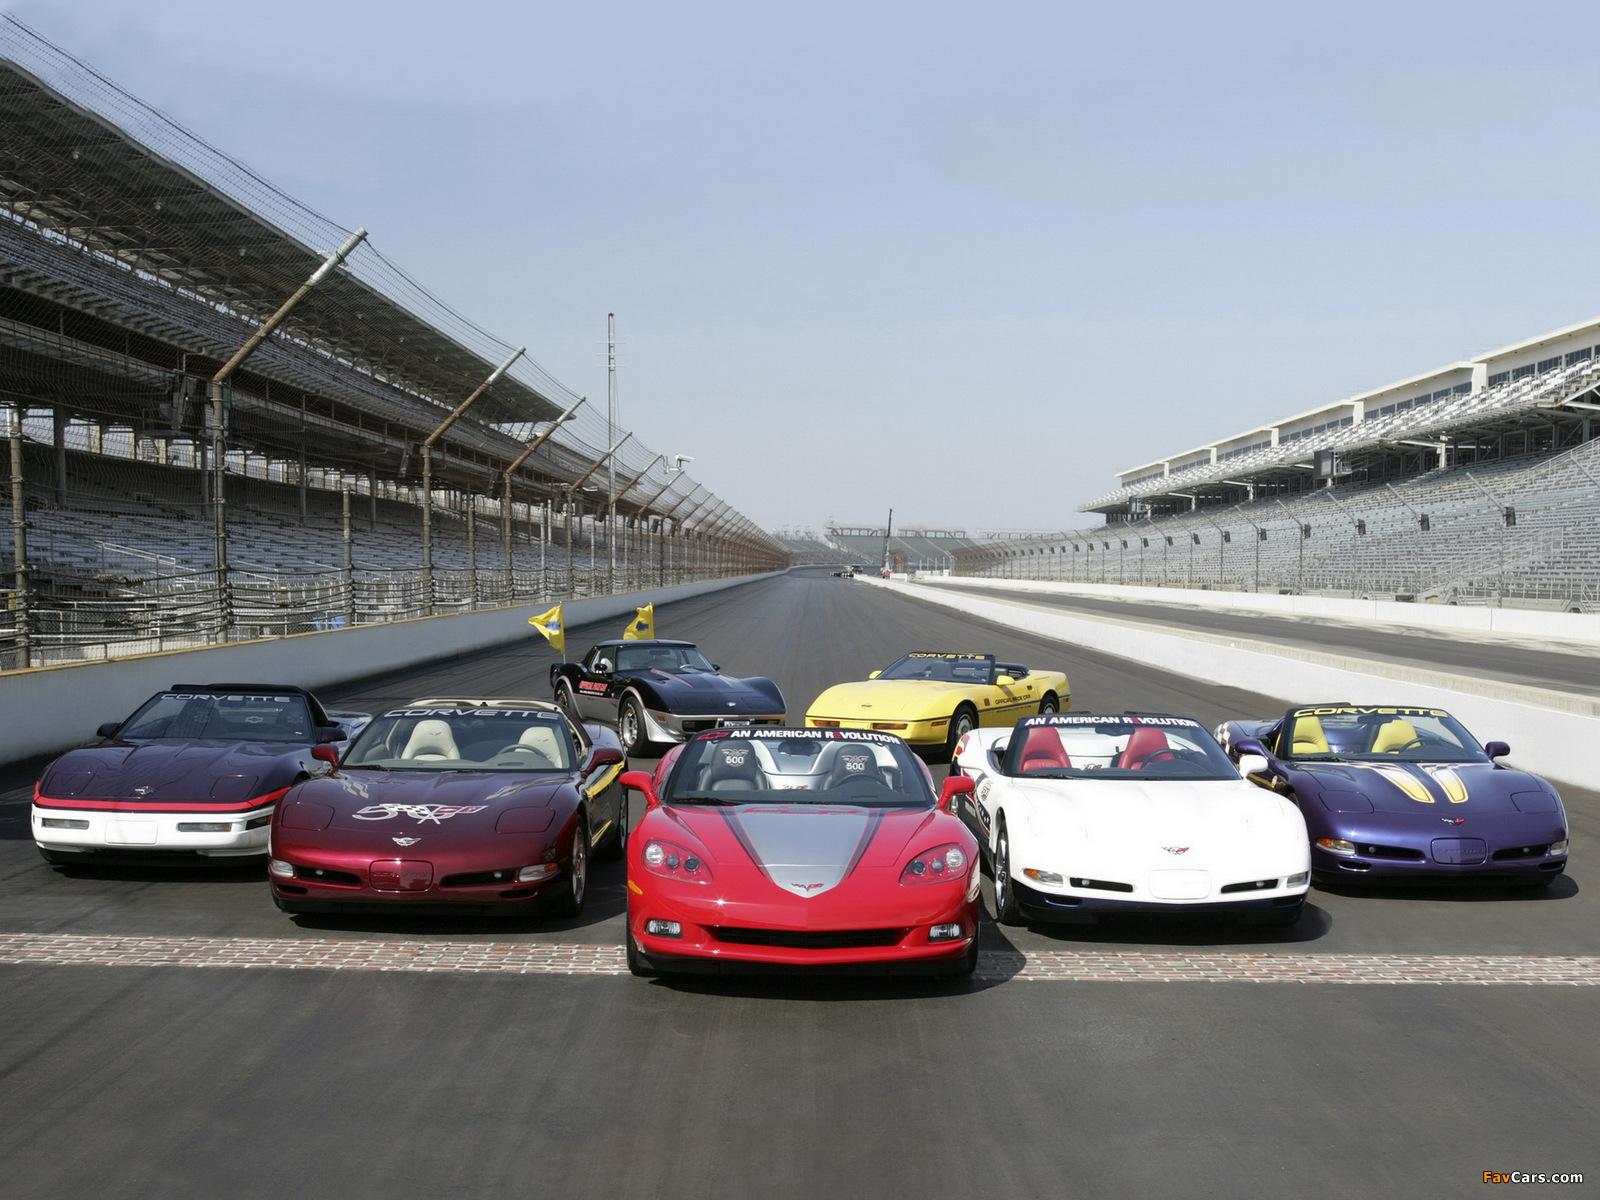 Corvette wallpapers (1600 x 1200)